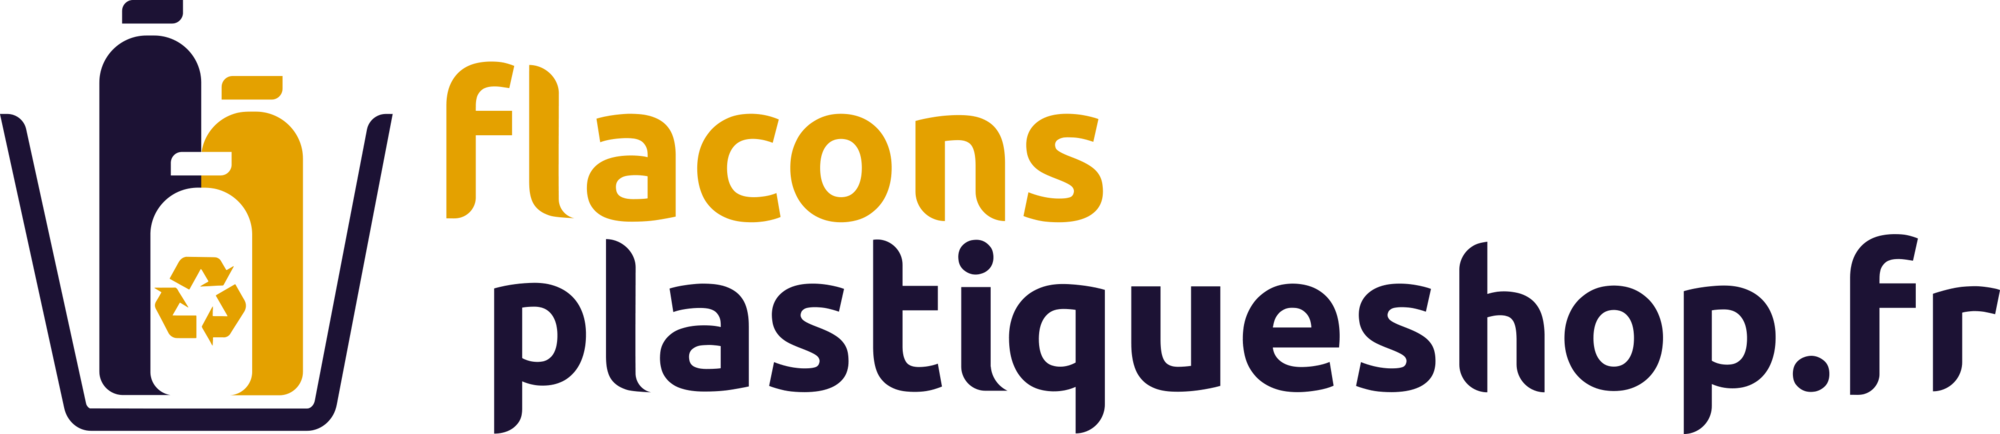 Flaconsplastiqueshop.fr